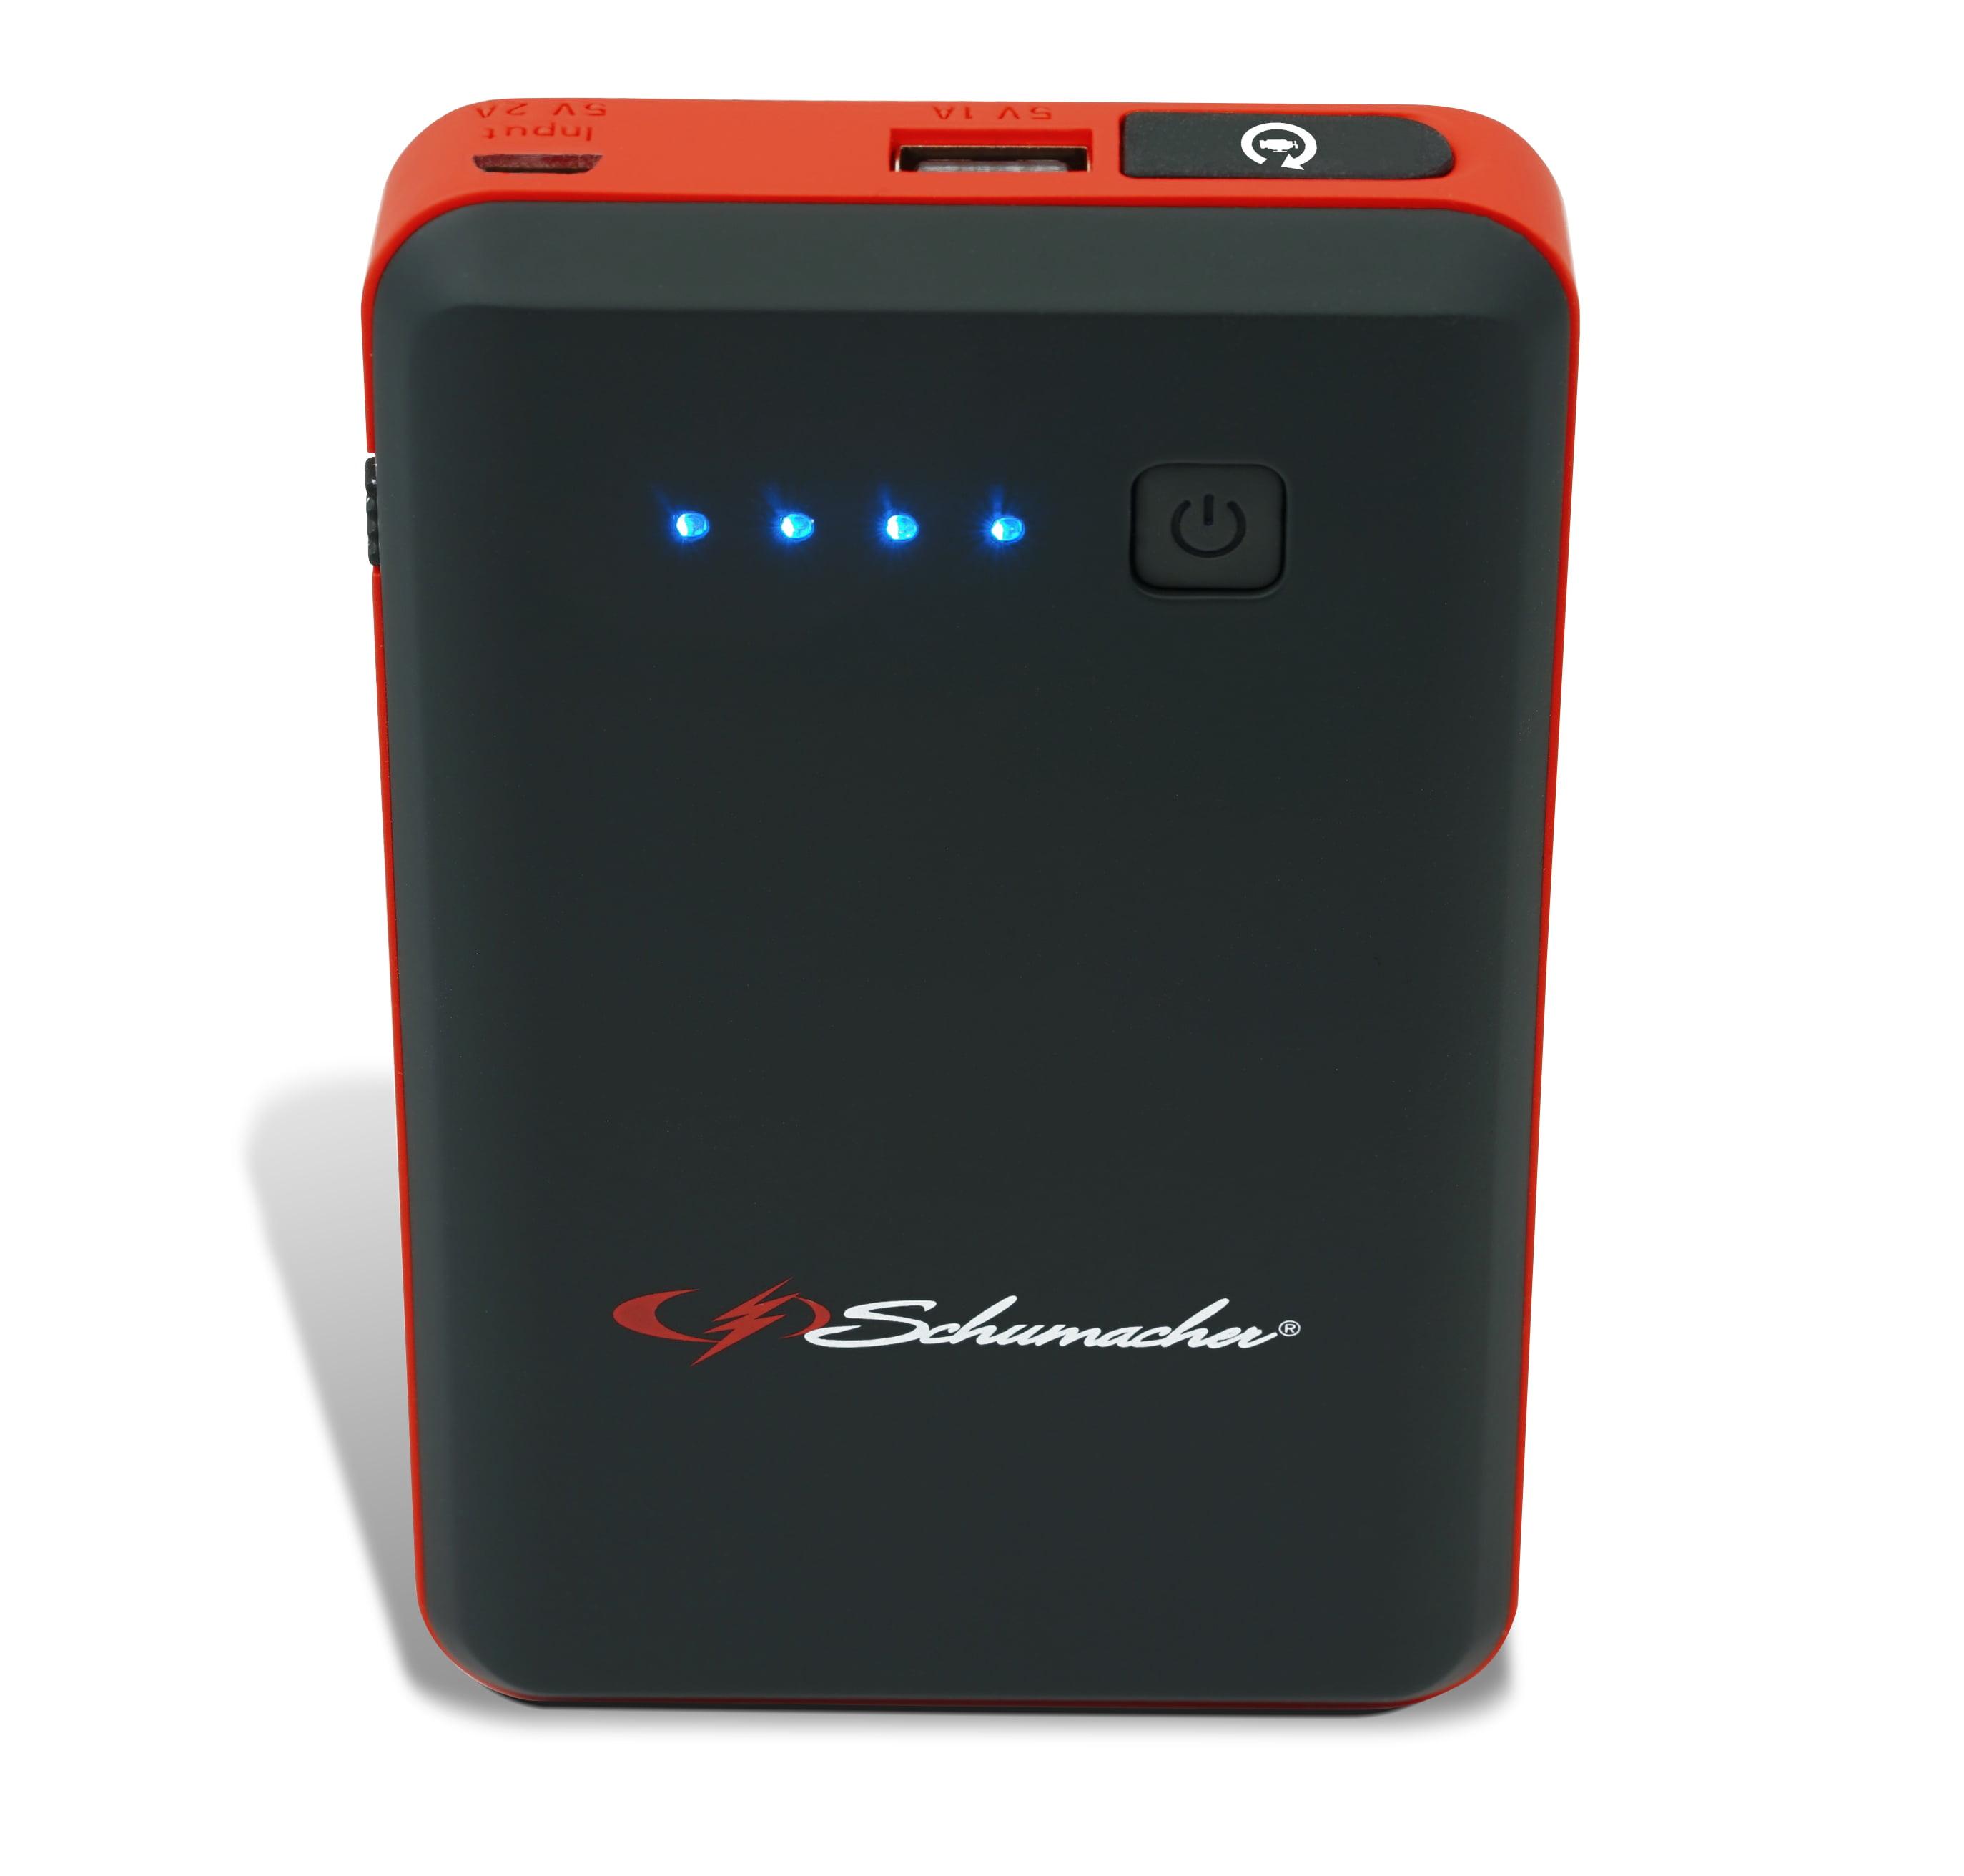 Schumacher Electric 400 Amp Lithium Ion Jumpstarter 2000 Sportage Fuse Box Indoor